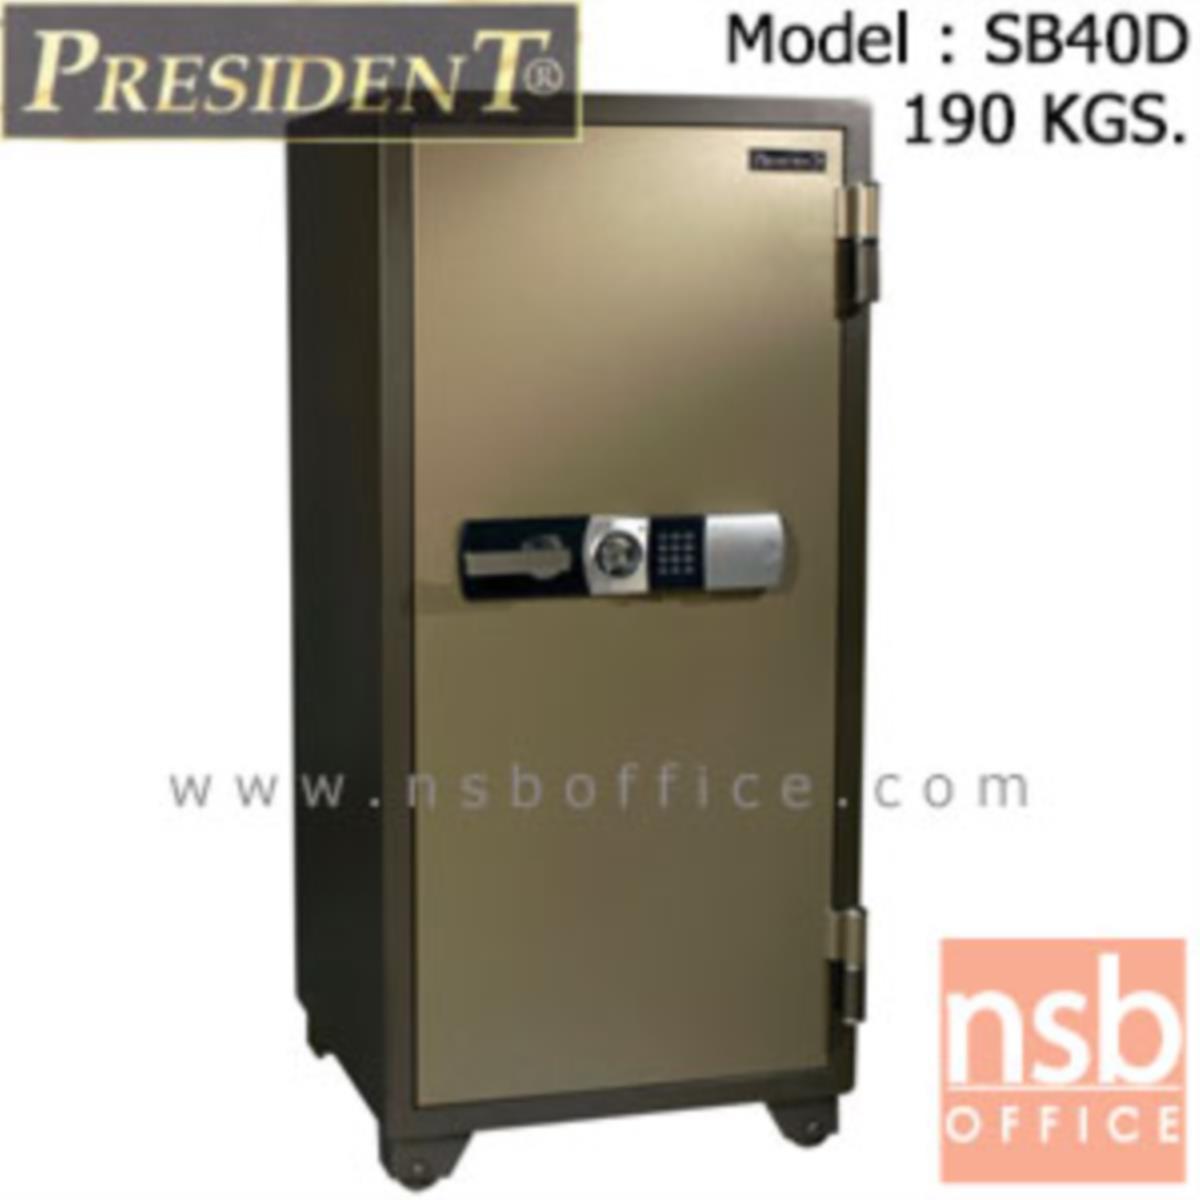 F05A044: ตู้เซฟนิรภัยชนิดดิจิตอล 190 กก.  รุ่น PRESIDENT-SB40D มี 1 กุญแจ 1 รหัส (ใช้กดหน้าตู้)